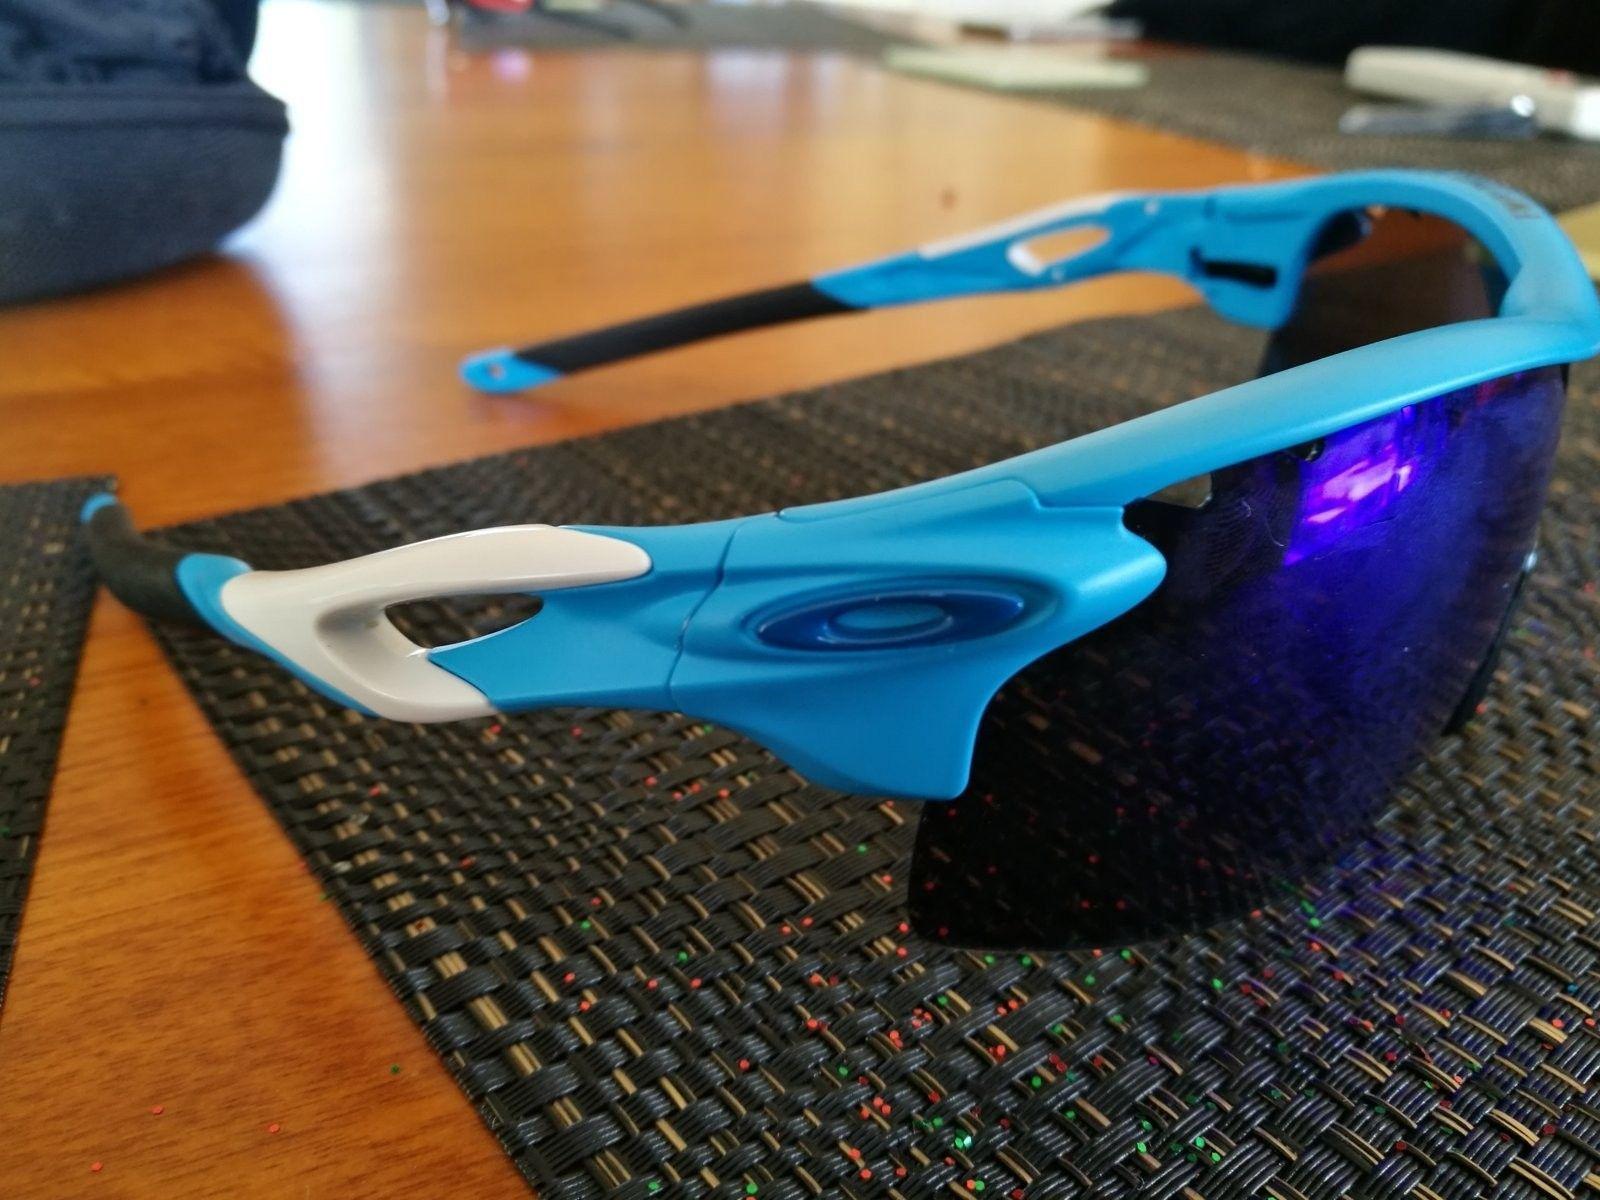 Radarlock XL Glacier blue help!: Not sure if Authentic or not - IMG_20160720_141512.jpg